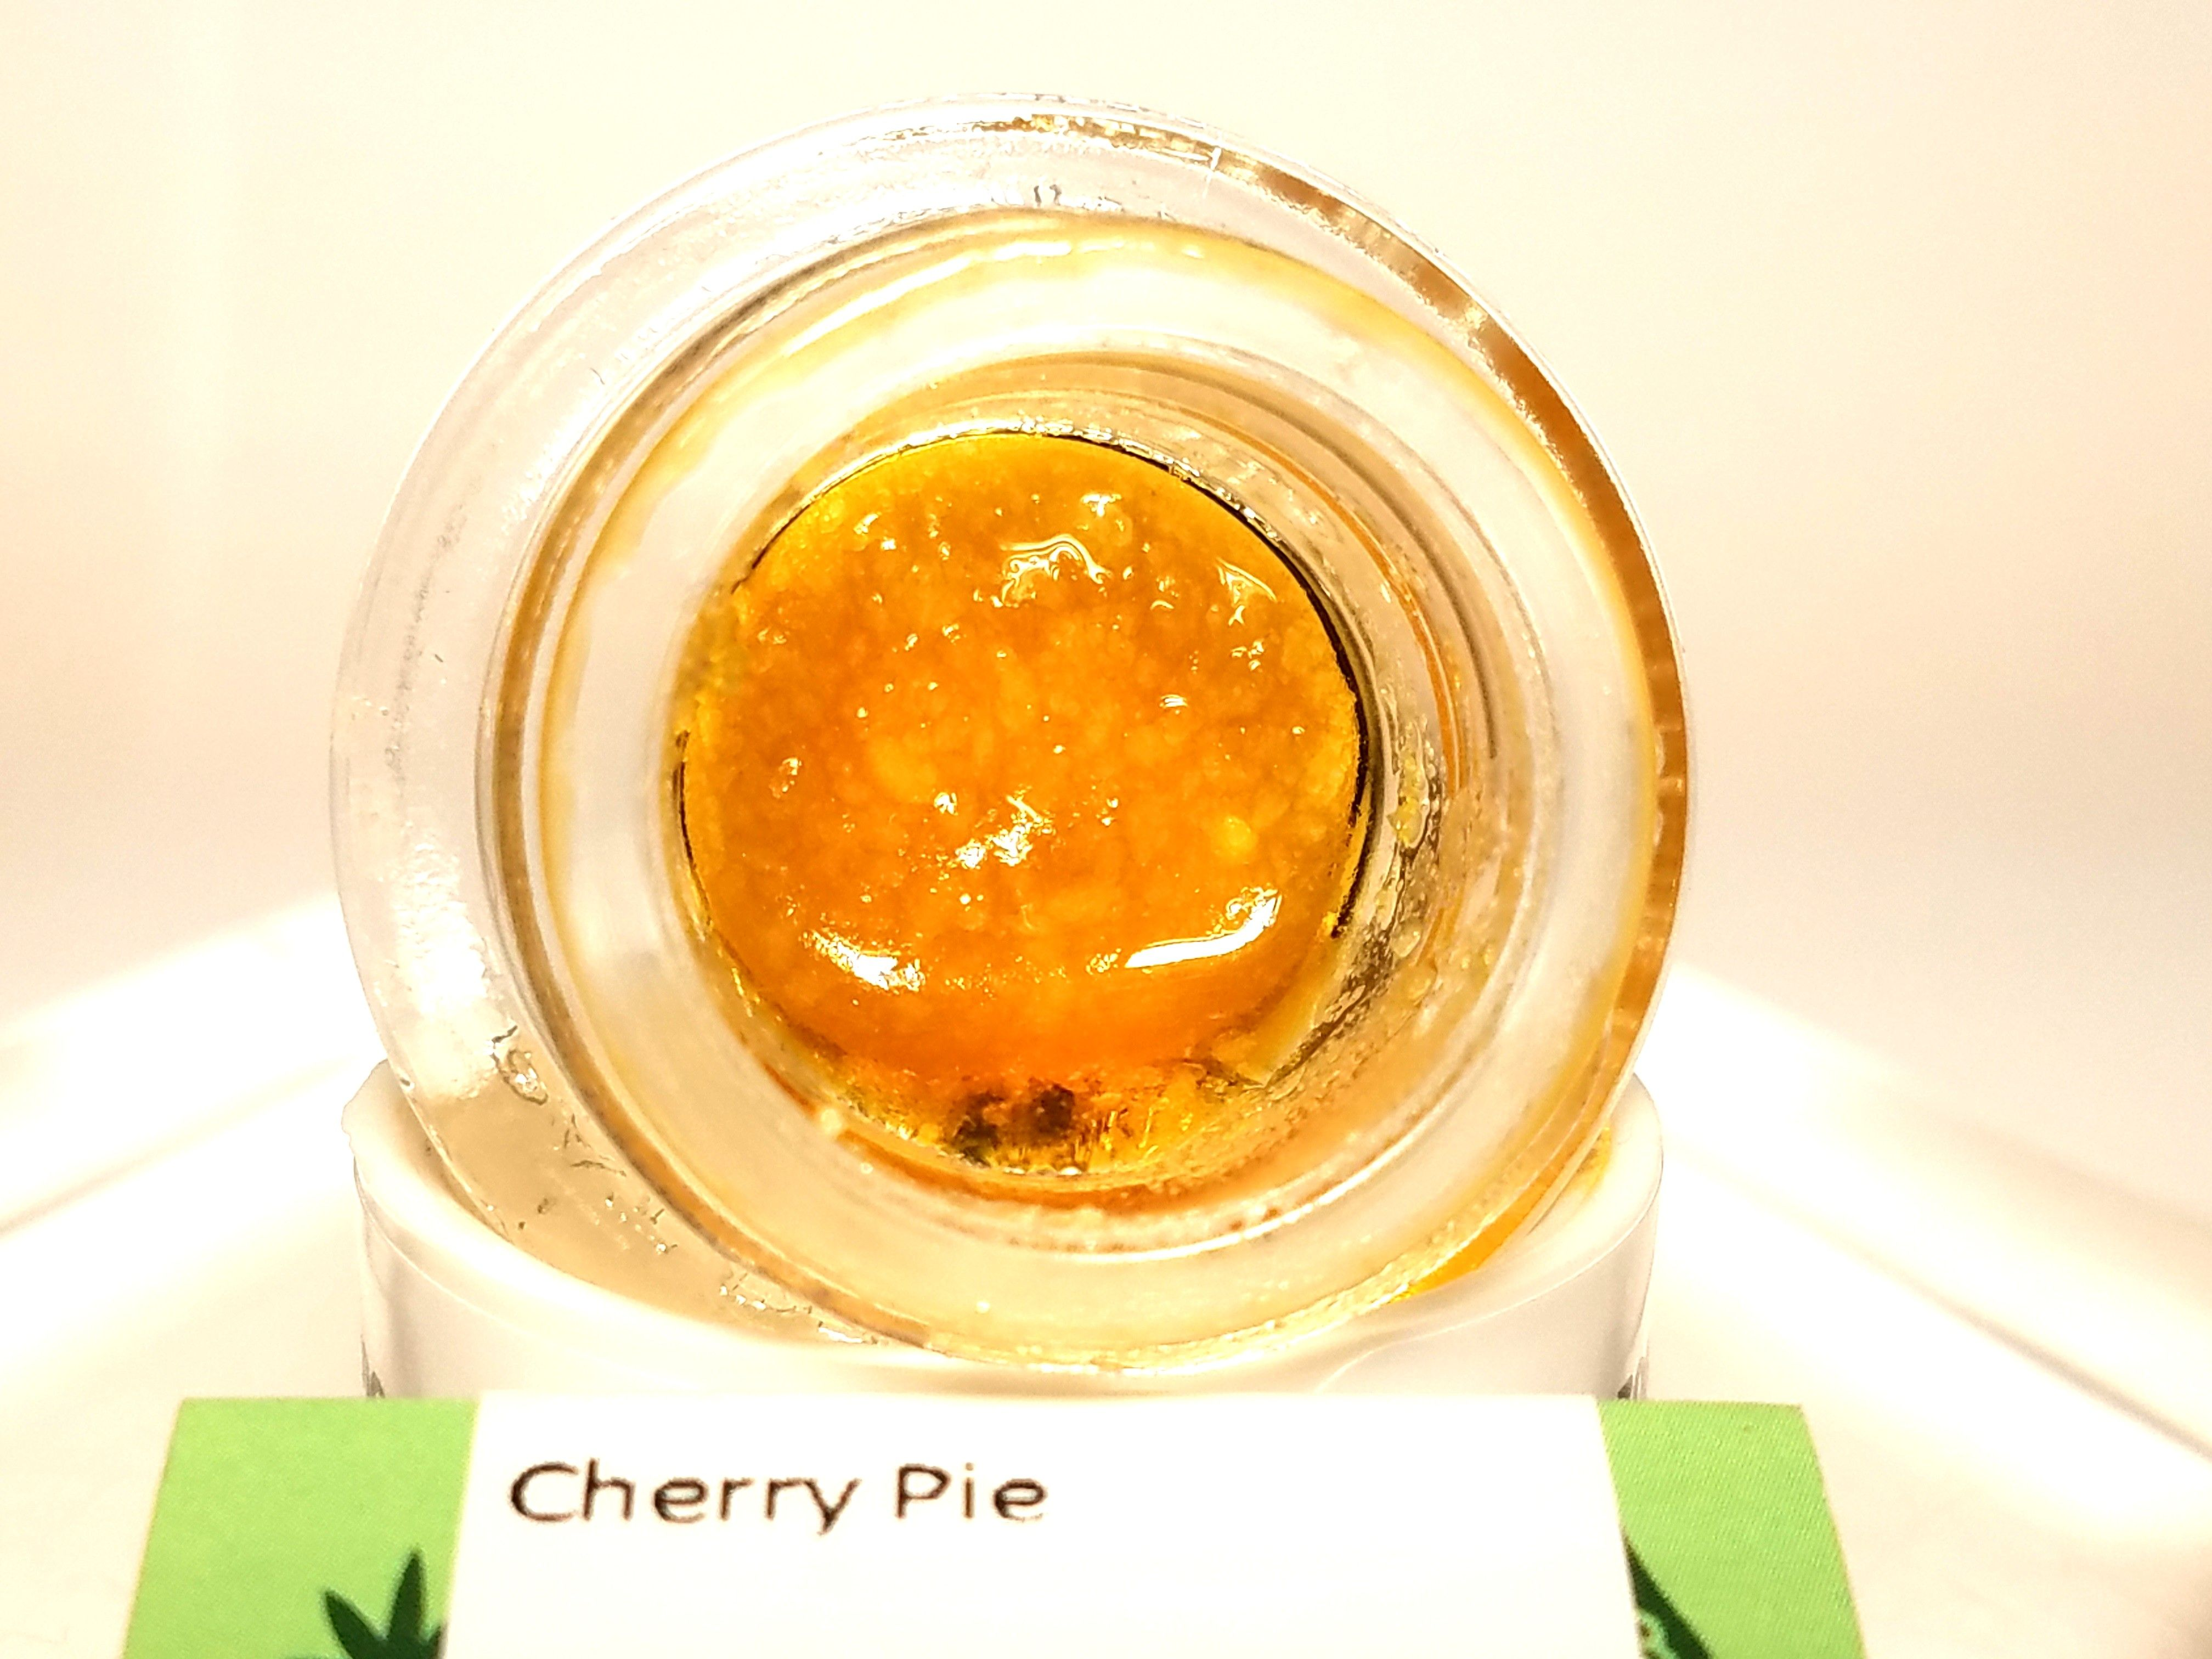 Bobsled - Cherry Pie, Hybrid, Live Resin